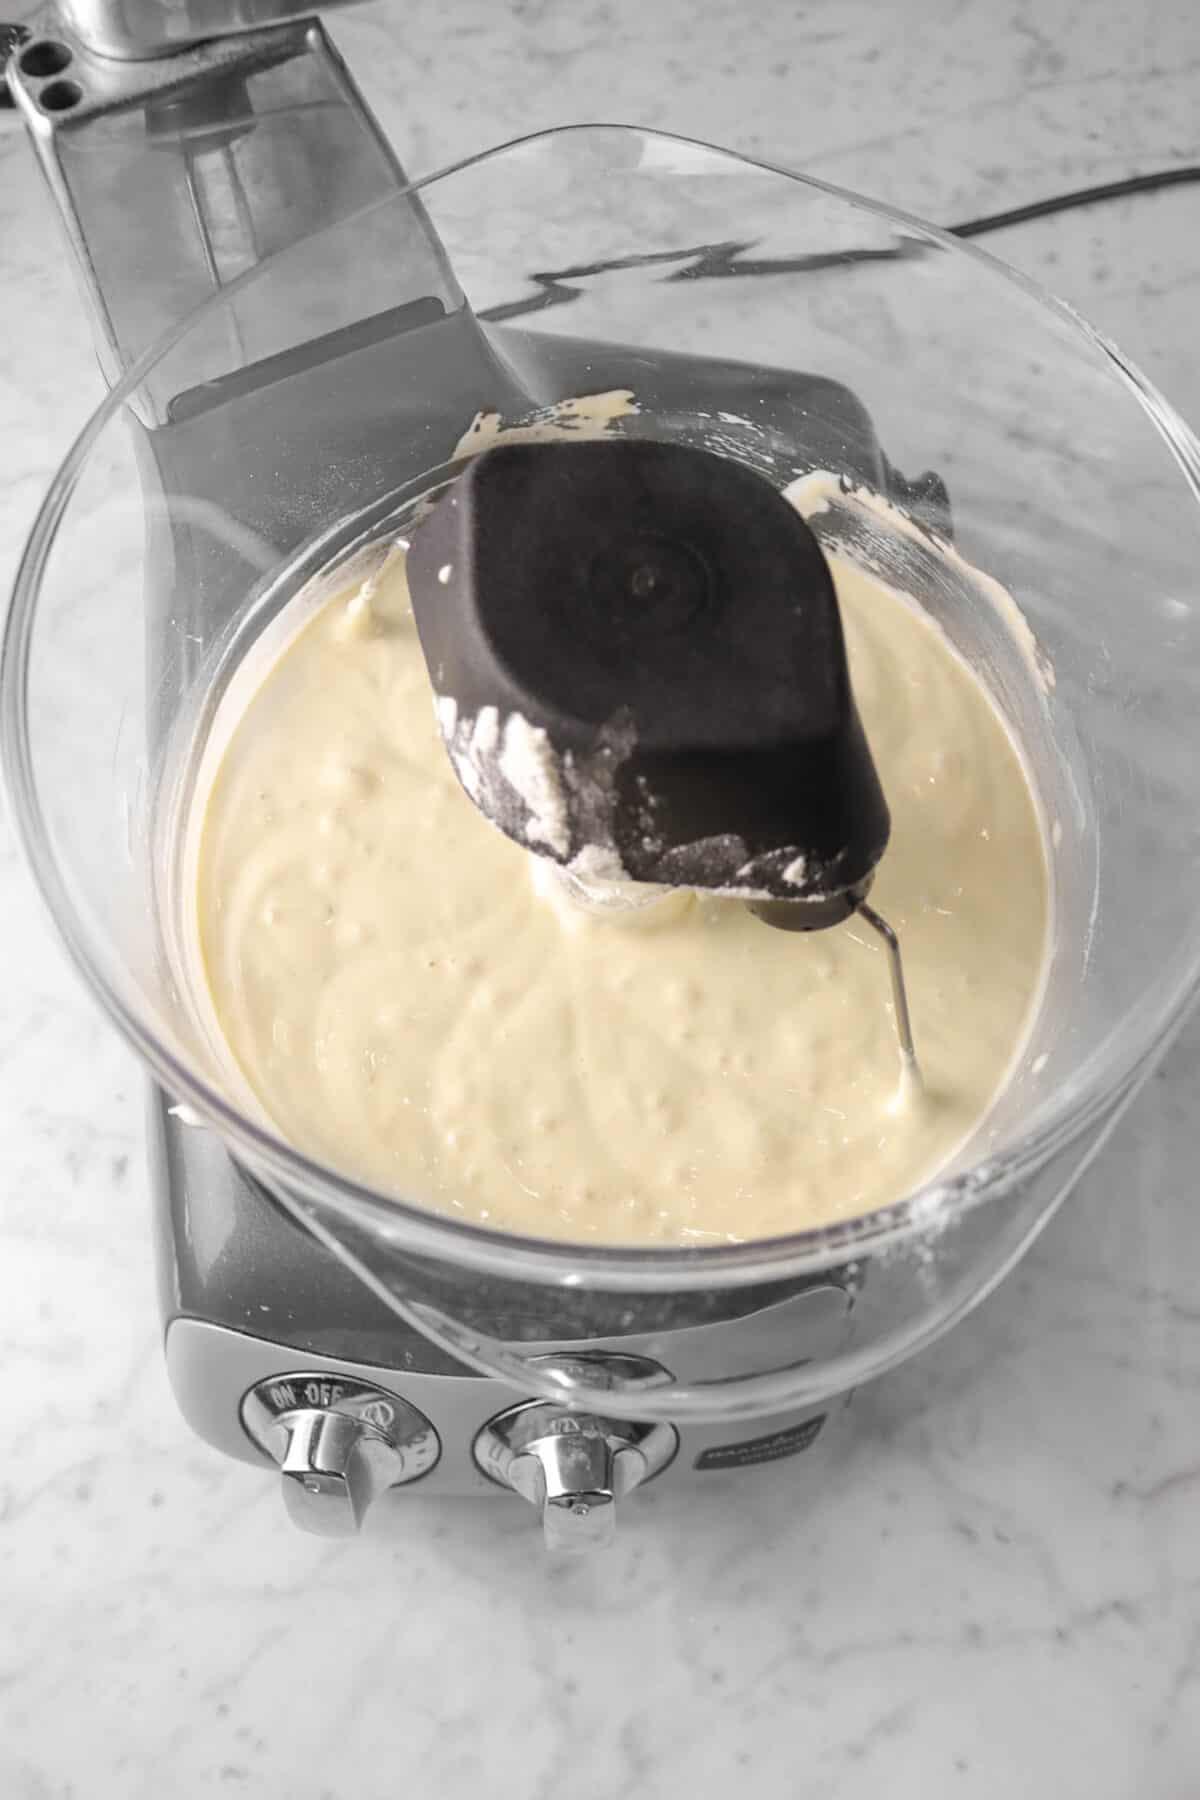 flour stirred into egg mixture